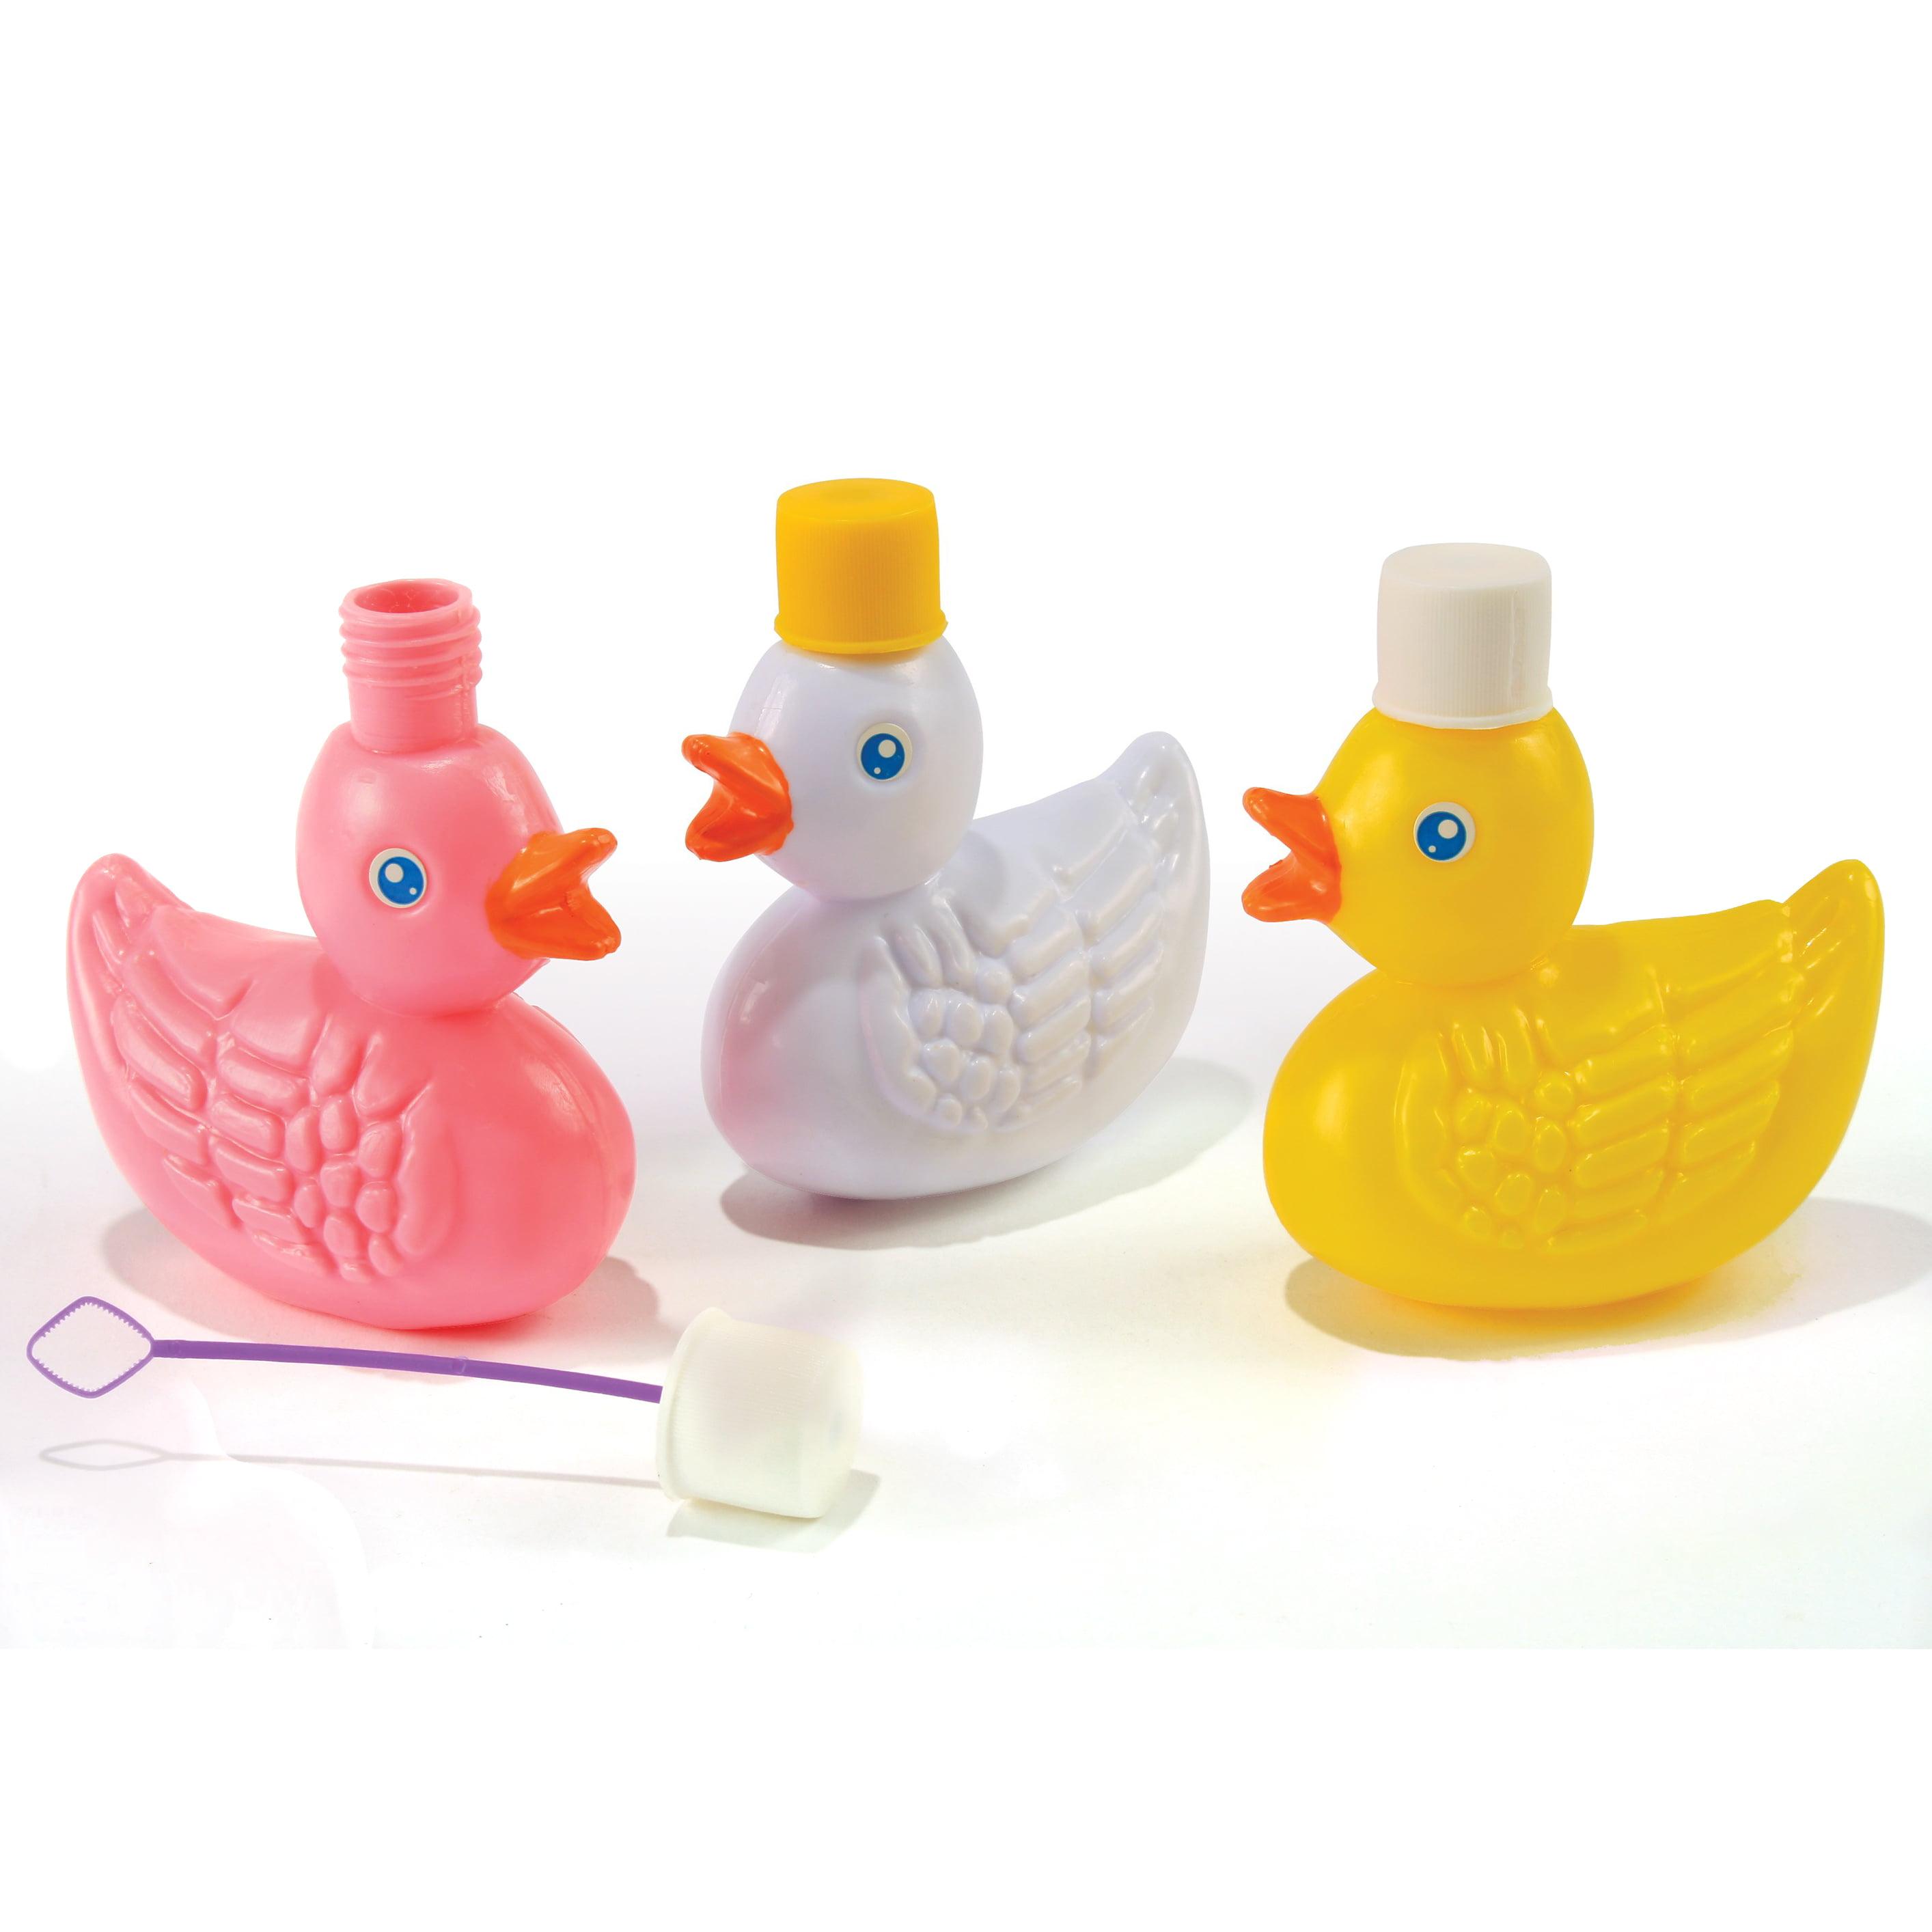 Fun Assorted Easter Li'l Duck Container 2.5 fl. oz Bubbles, Assorted